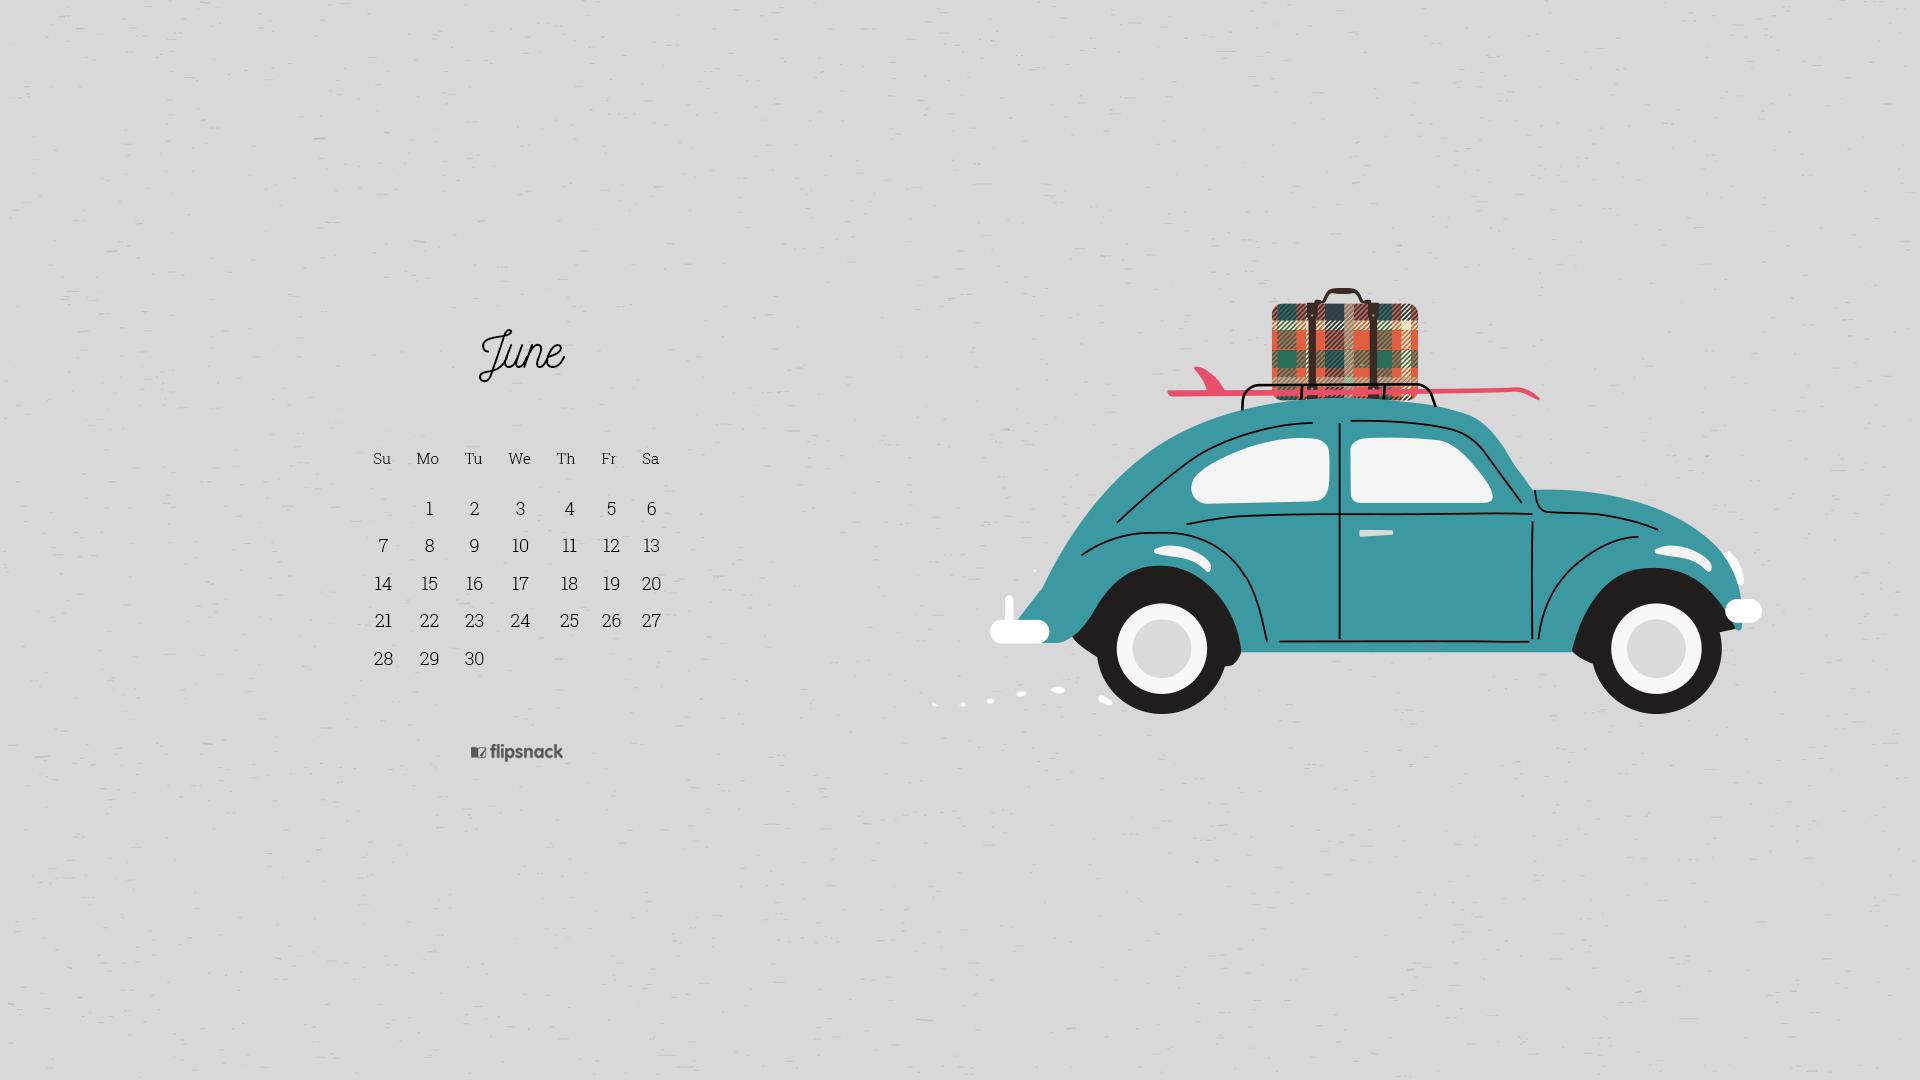 Free 2020 Wallpaper Calendars January December Flipsnack Blog